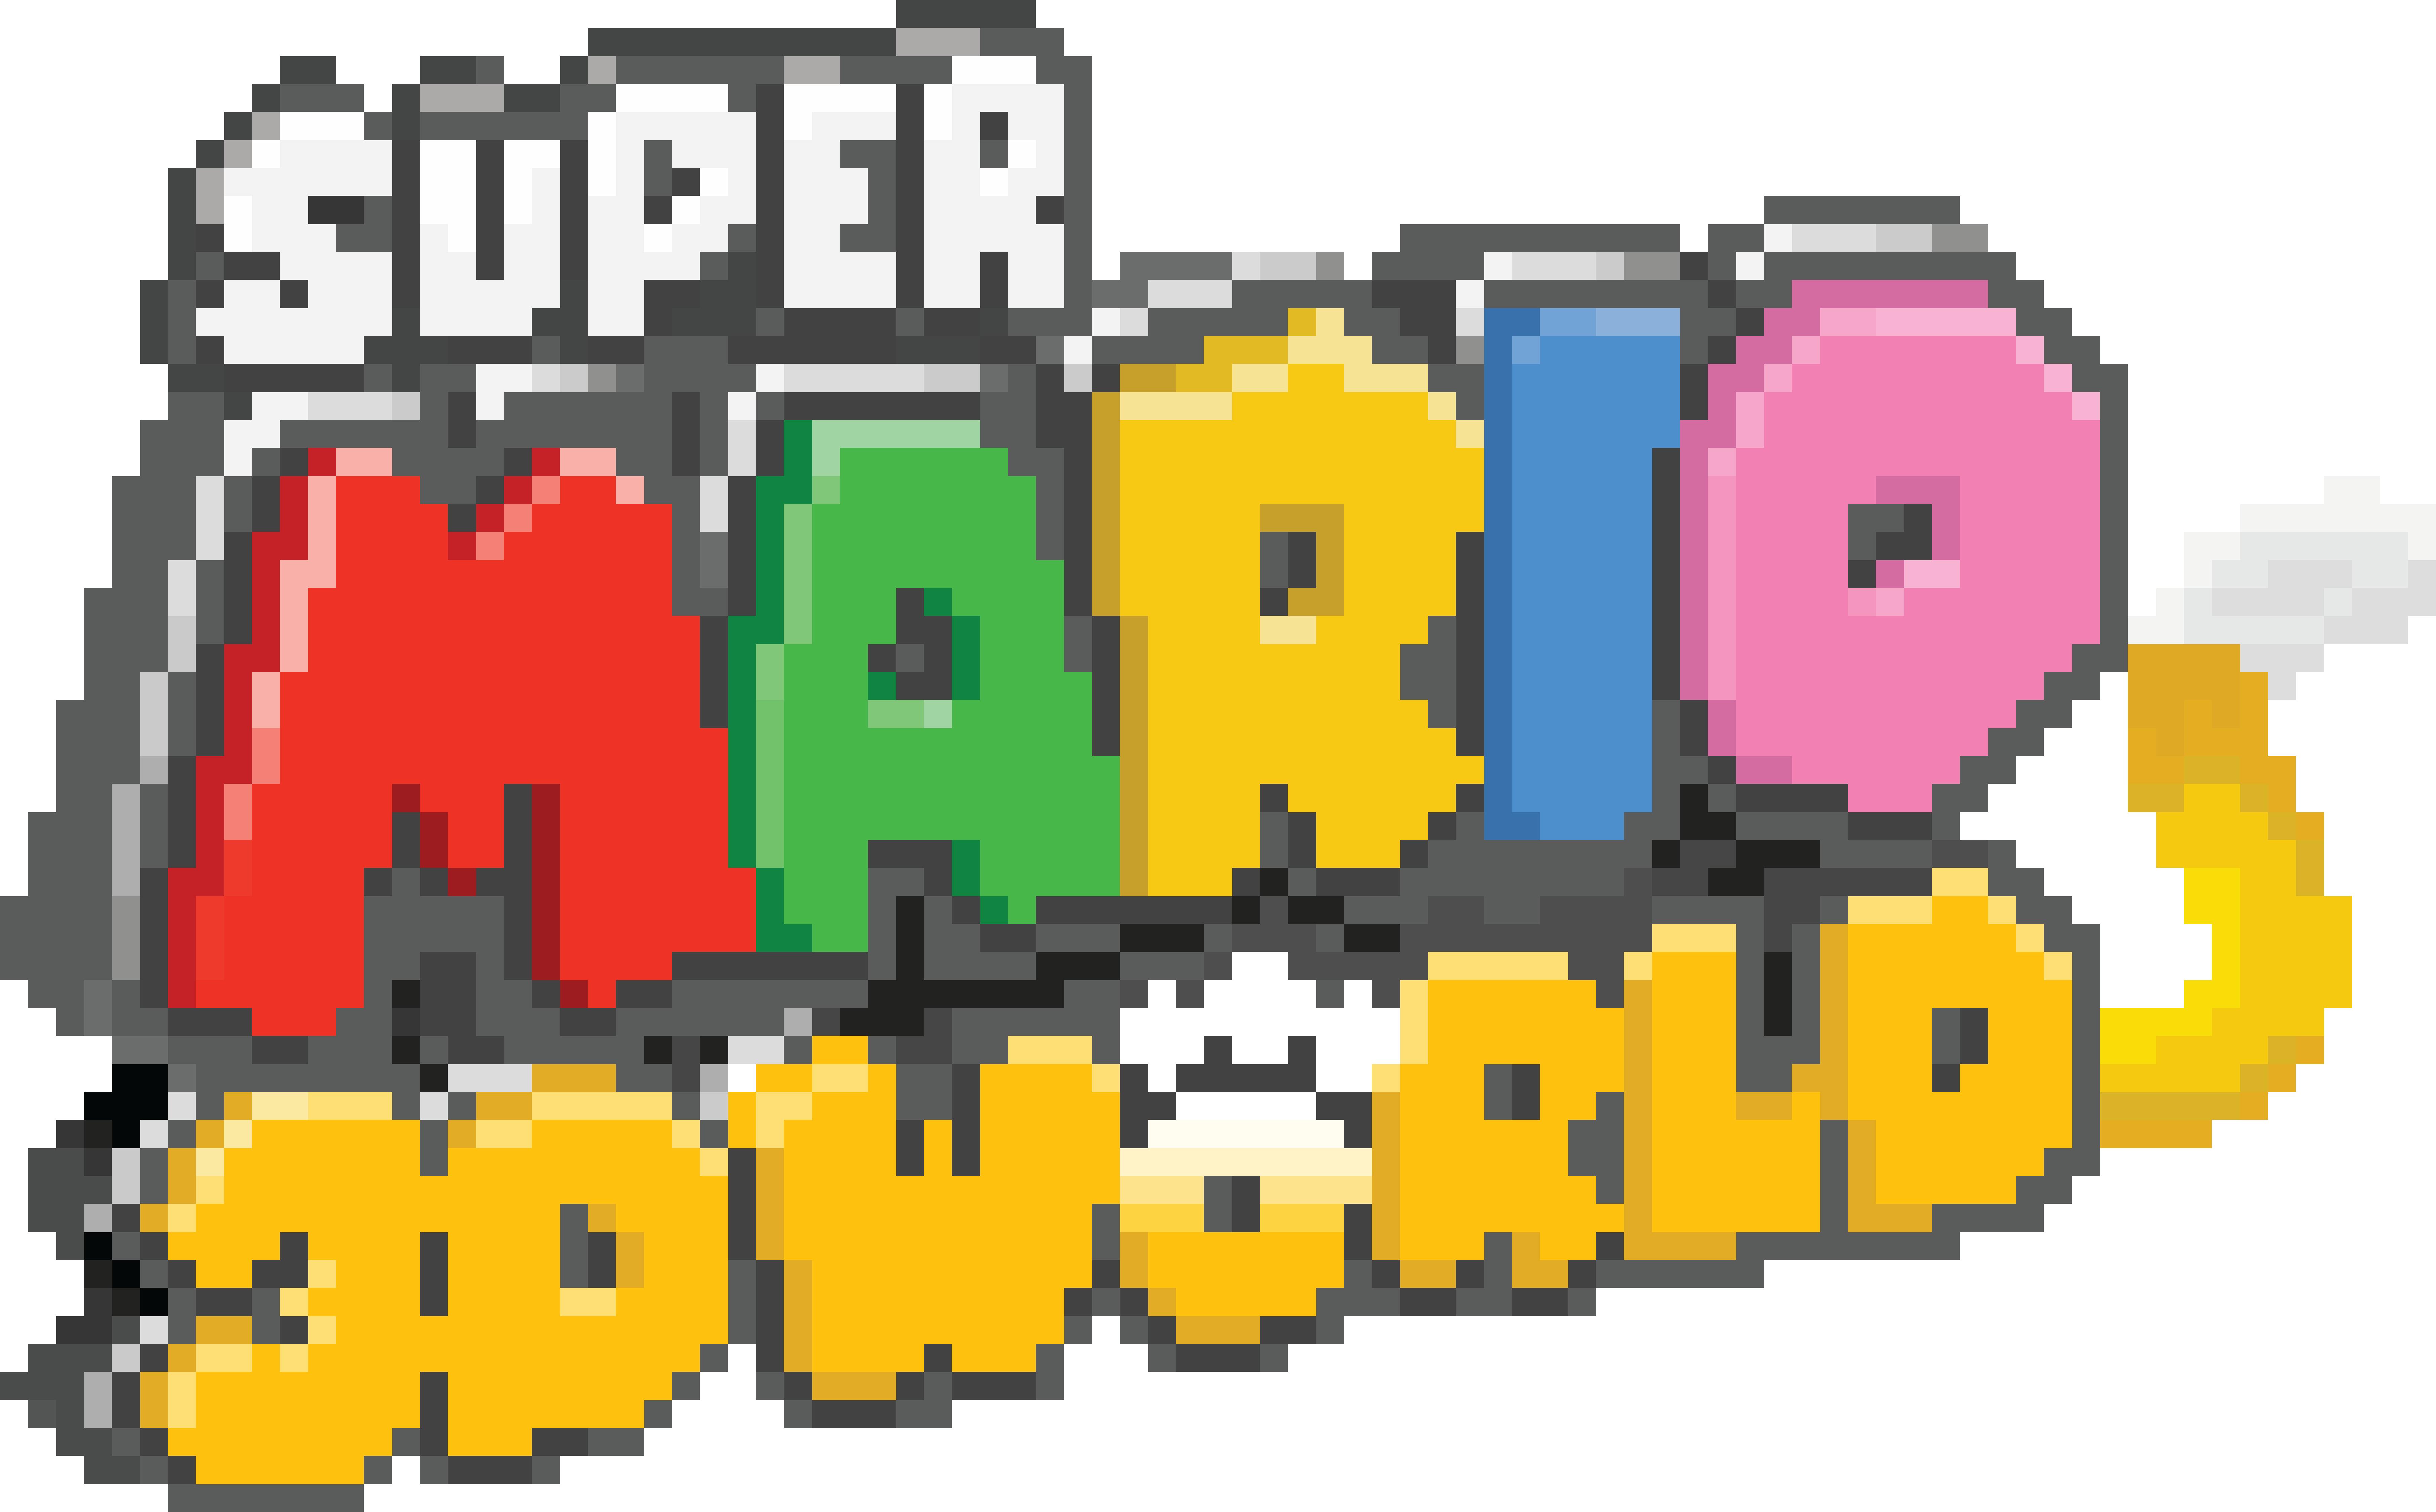 Super Mario 3d World Logo Pixel Art By Djtoast3 On Deviantart